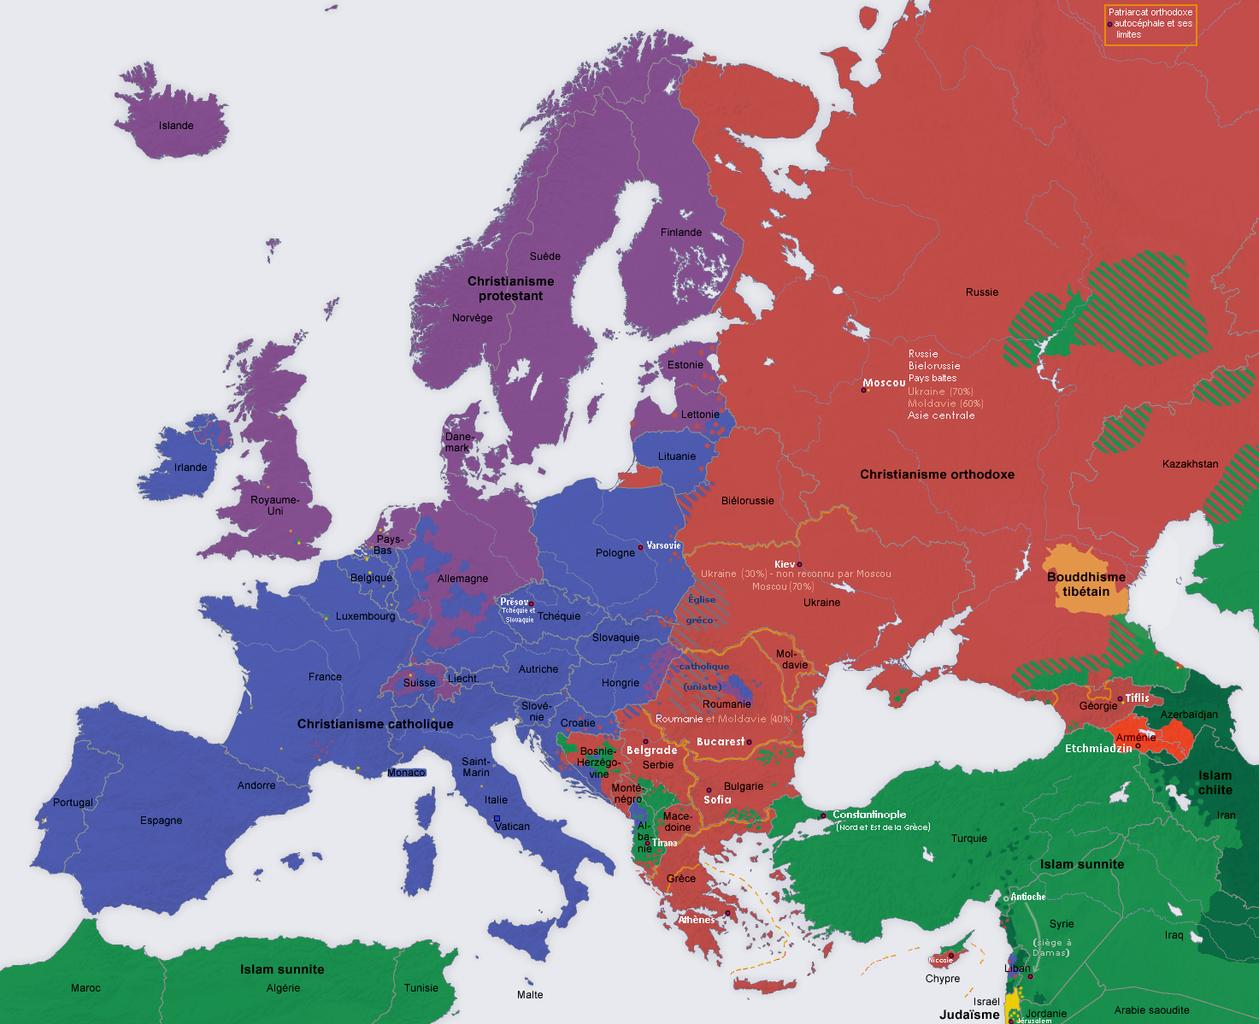 CIA pokrenula woke kampanju gdje slavi raznolikost svojih uposlenika - Page 2 1259px-Europe_religion_map_situation_1950_fr